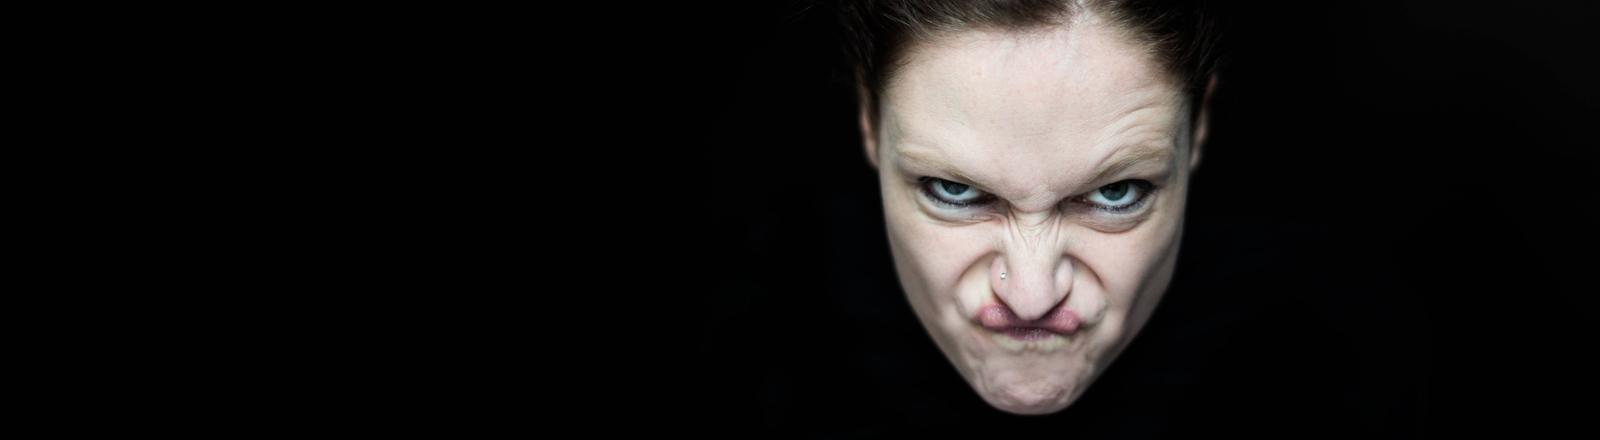 Eine wütende Frau.